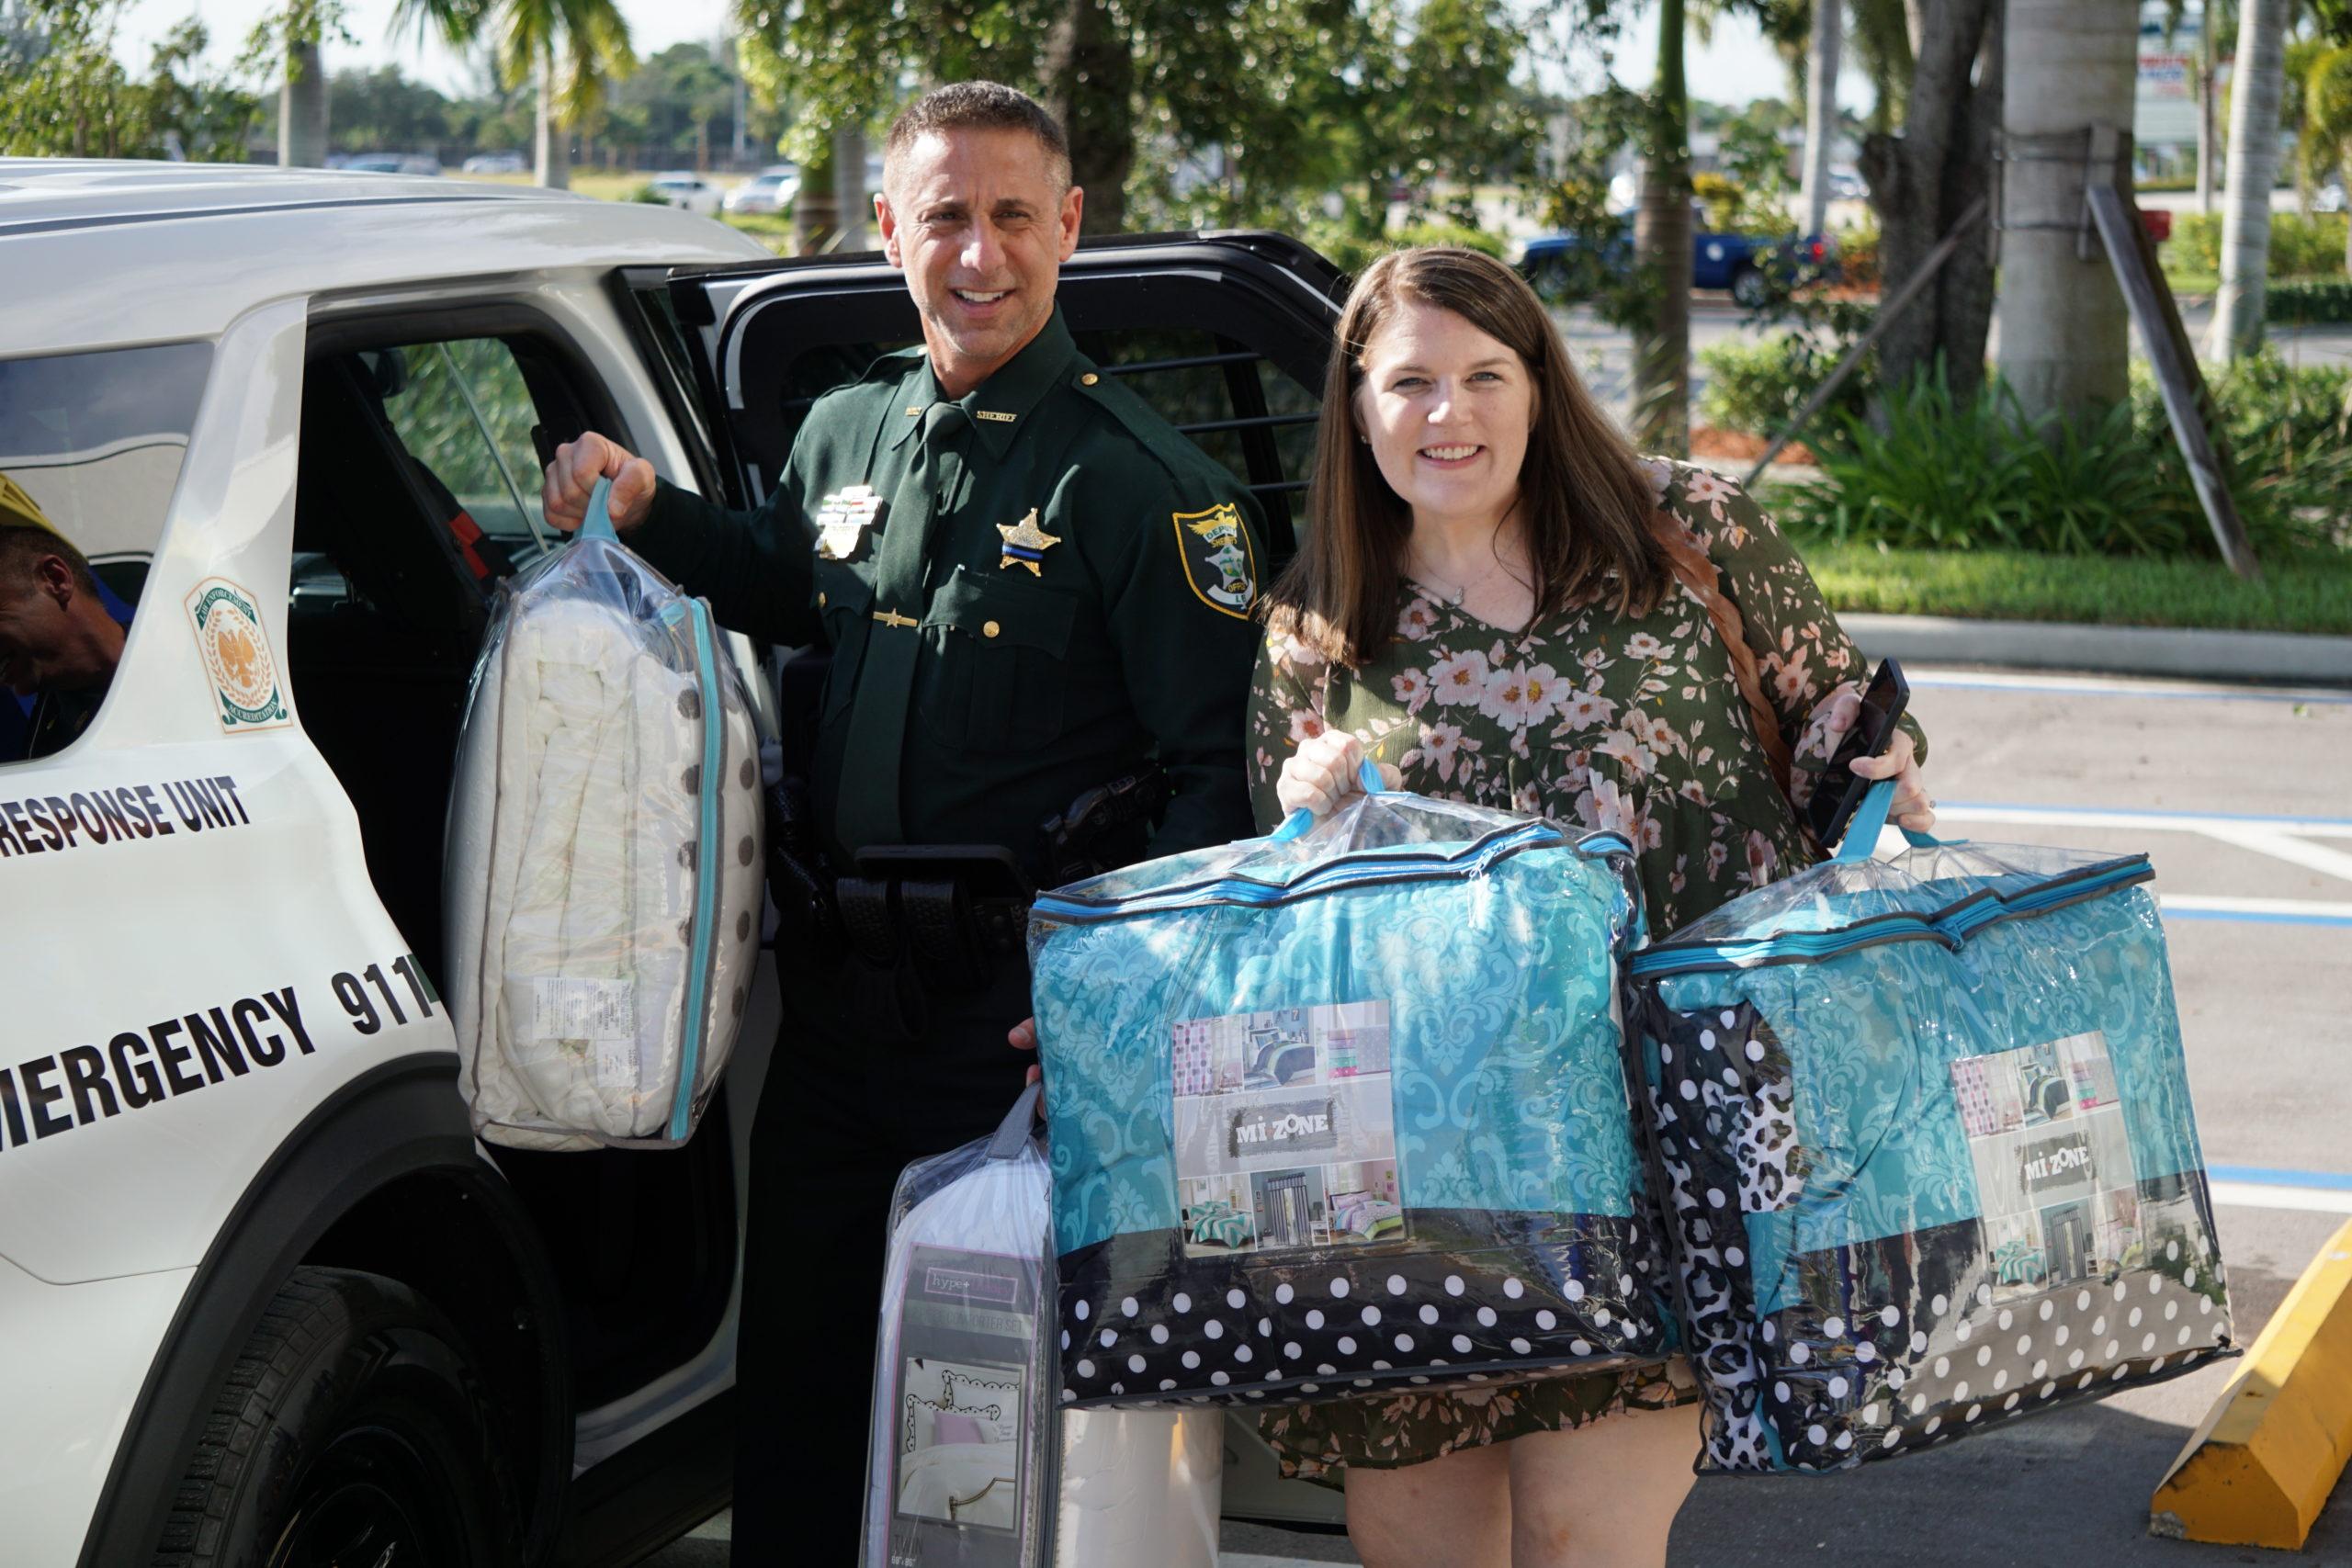 09 - Sgt. Michael Truscott, Jessica Stanfield